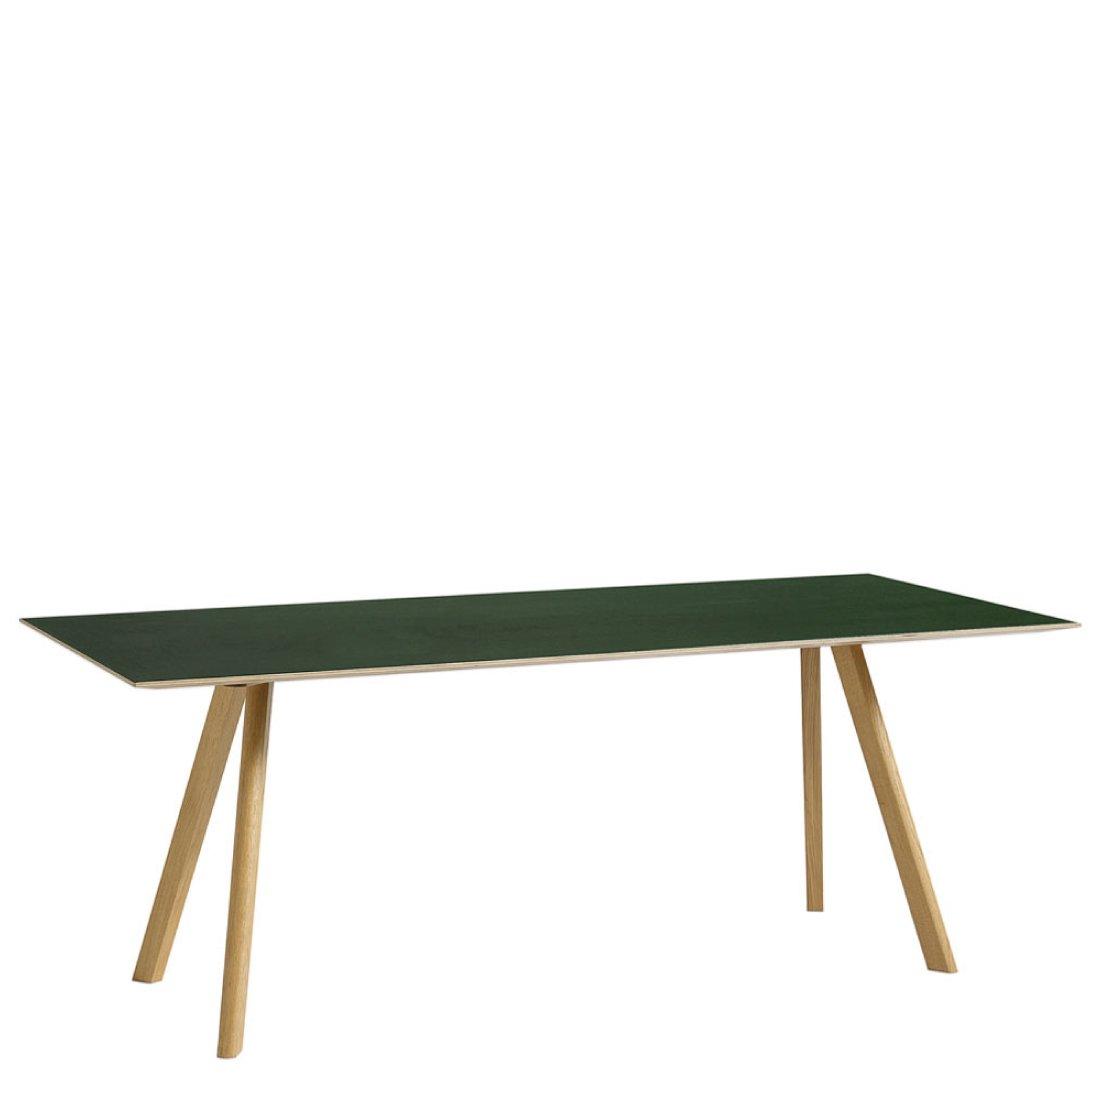 HAY CPH30 Tafel 200 x 90 cm Gelakt Eiken - Groen